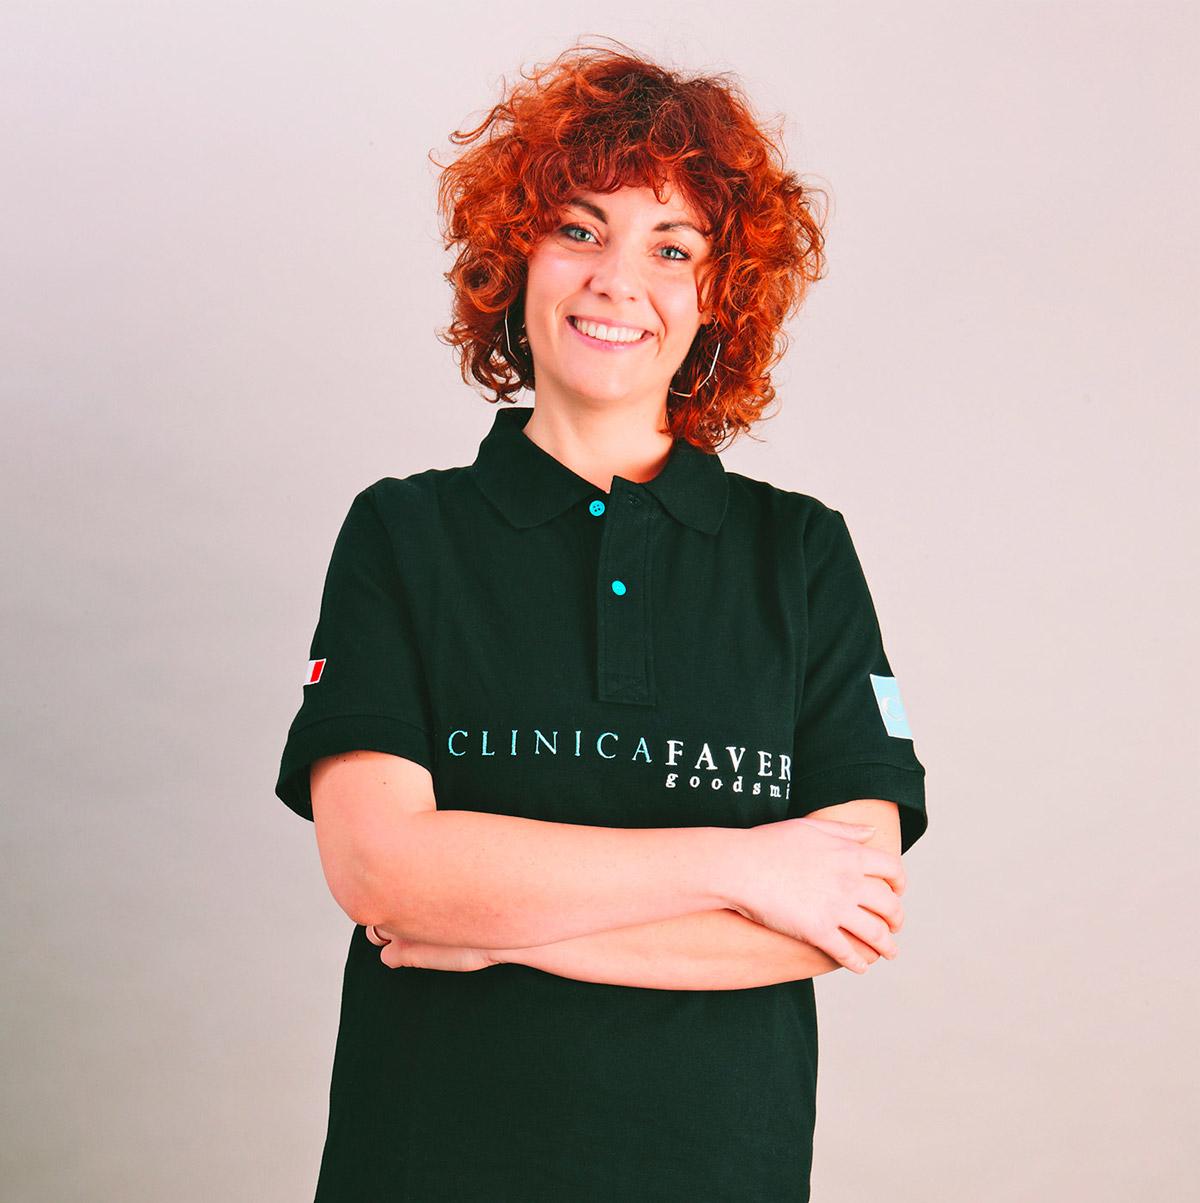 Dott.ssa Margherita Favero